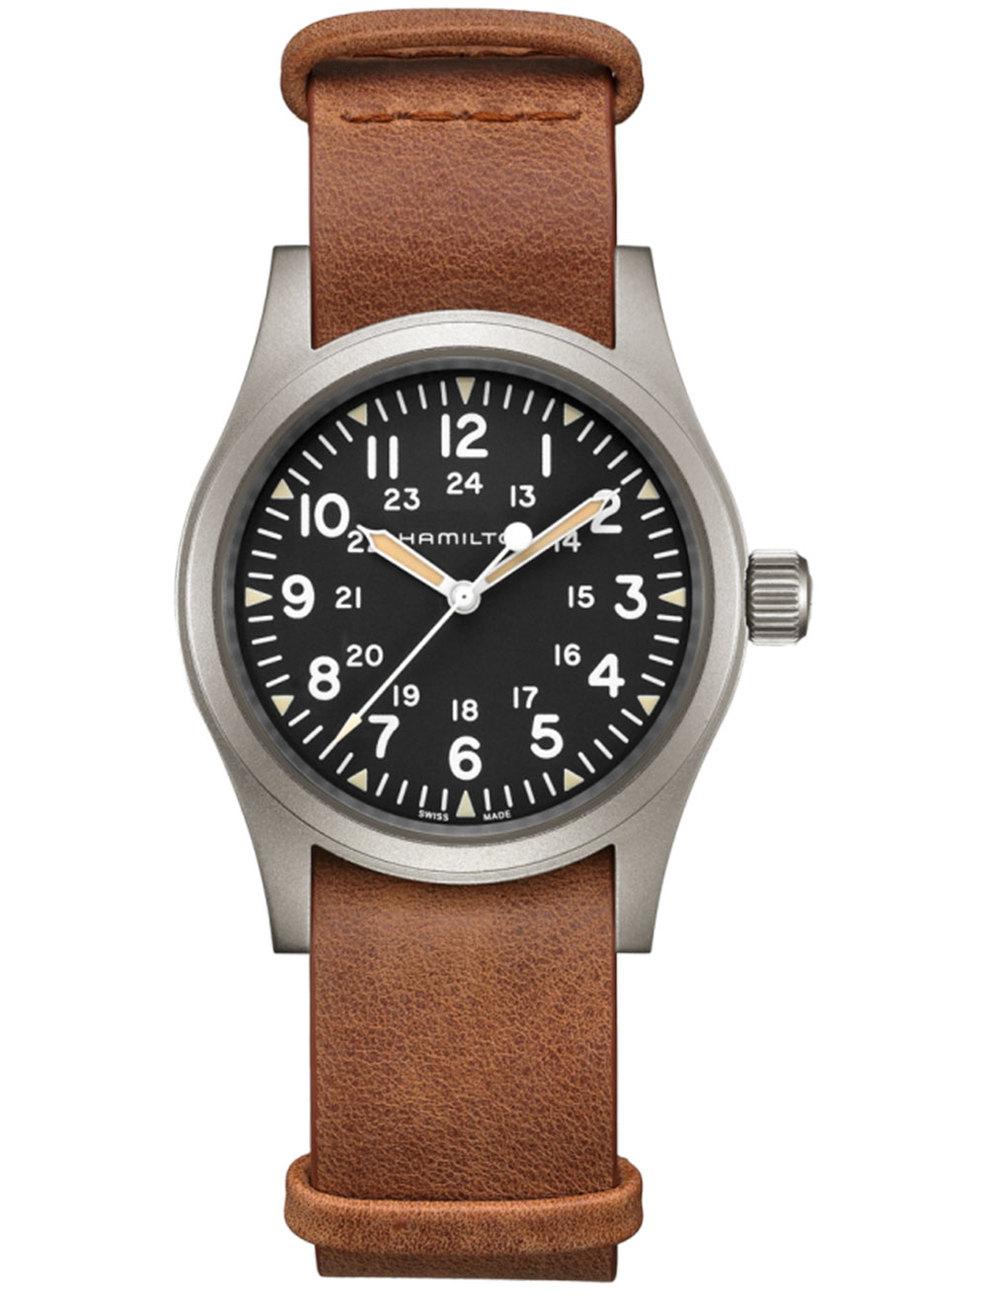 Hamilton: Stainless Steel 38mm Khaki Field Mechanical Movement Watch